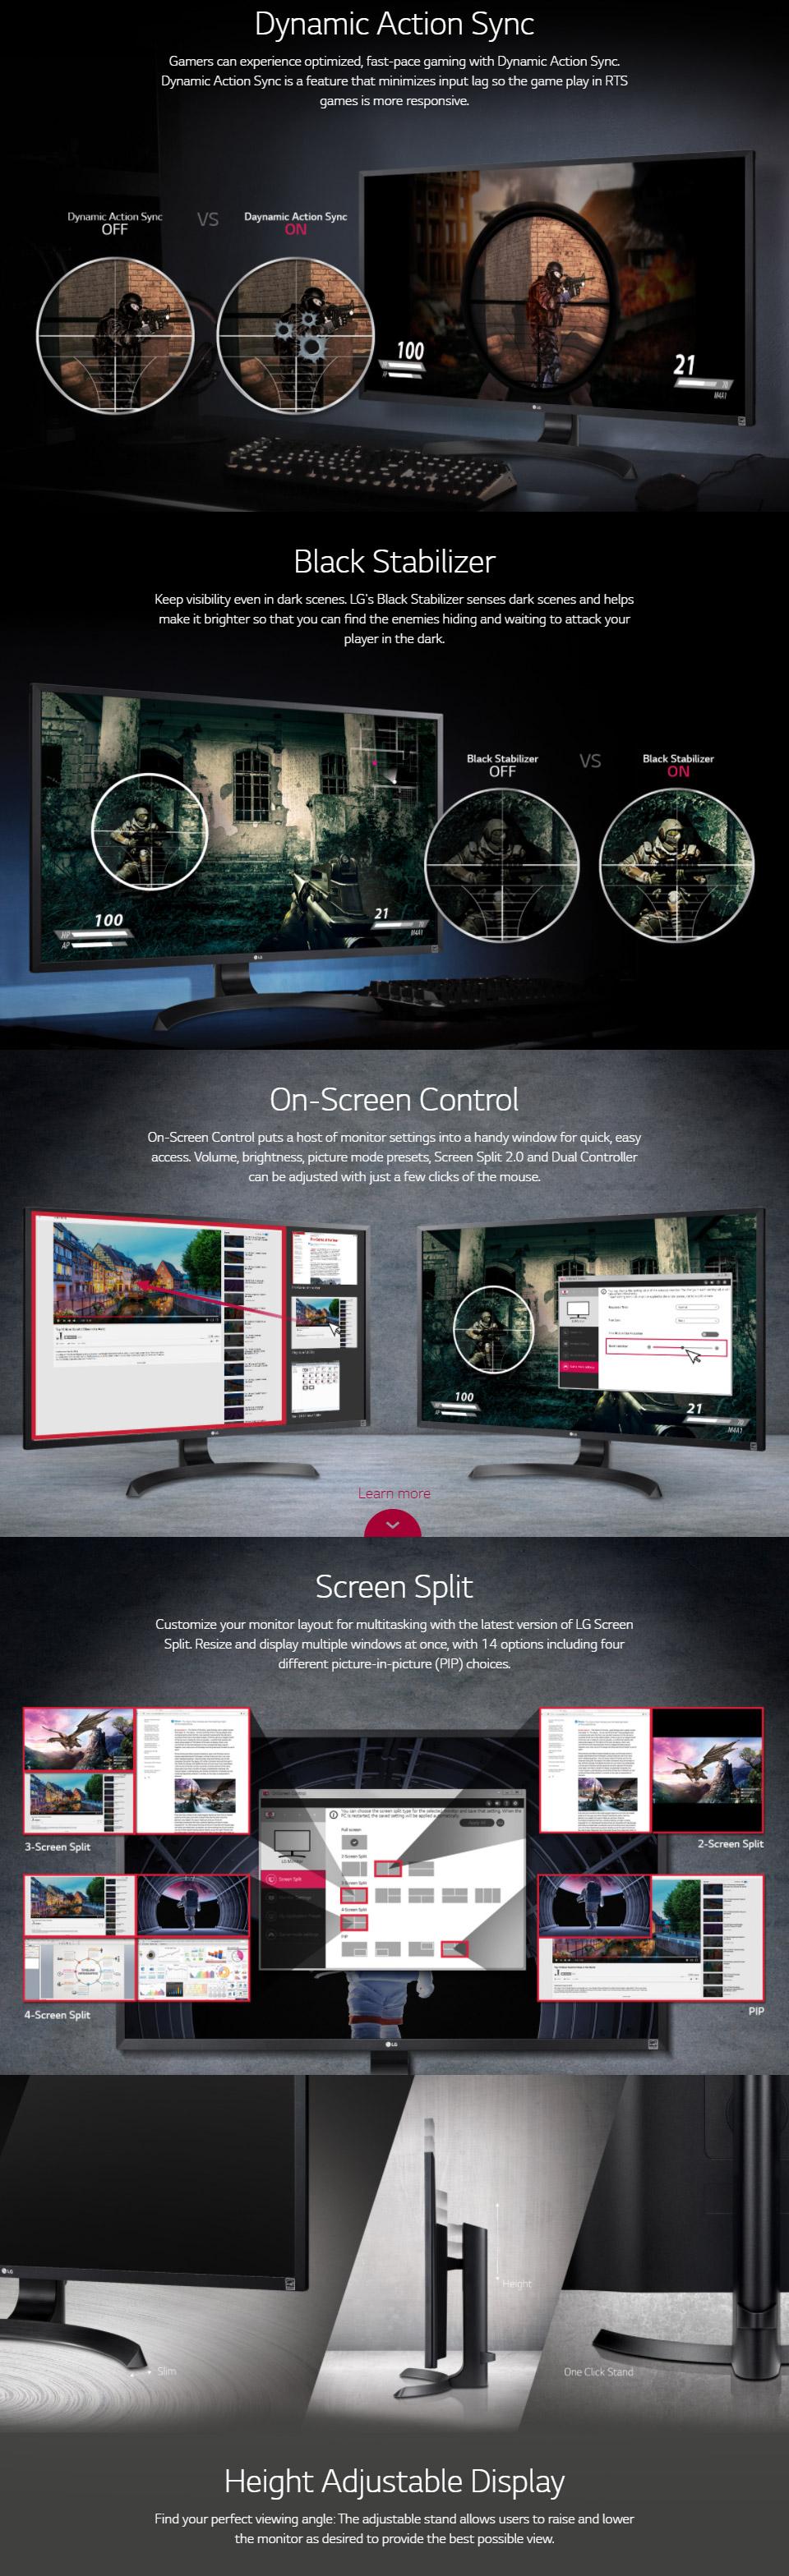 LG 32UD59-B 32in 4K UHD LED Monitor [32UD59-B] : PC Case Gear